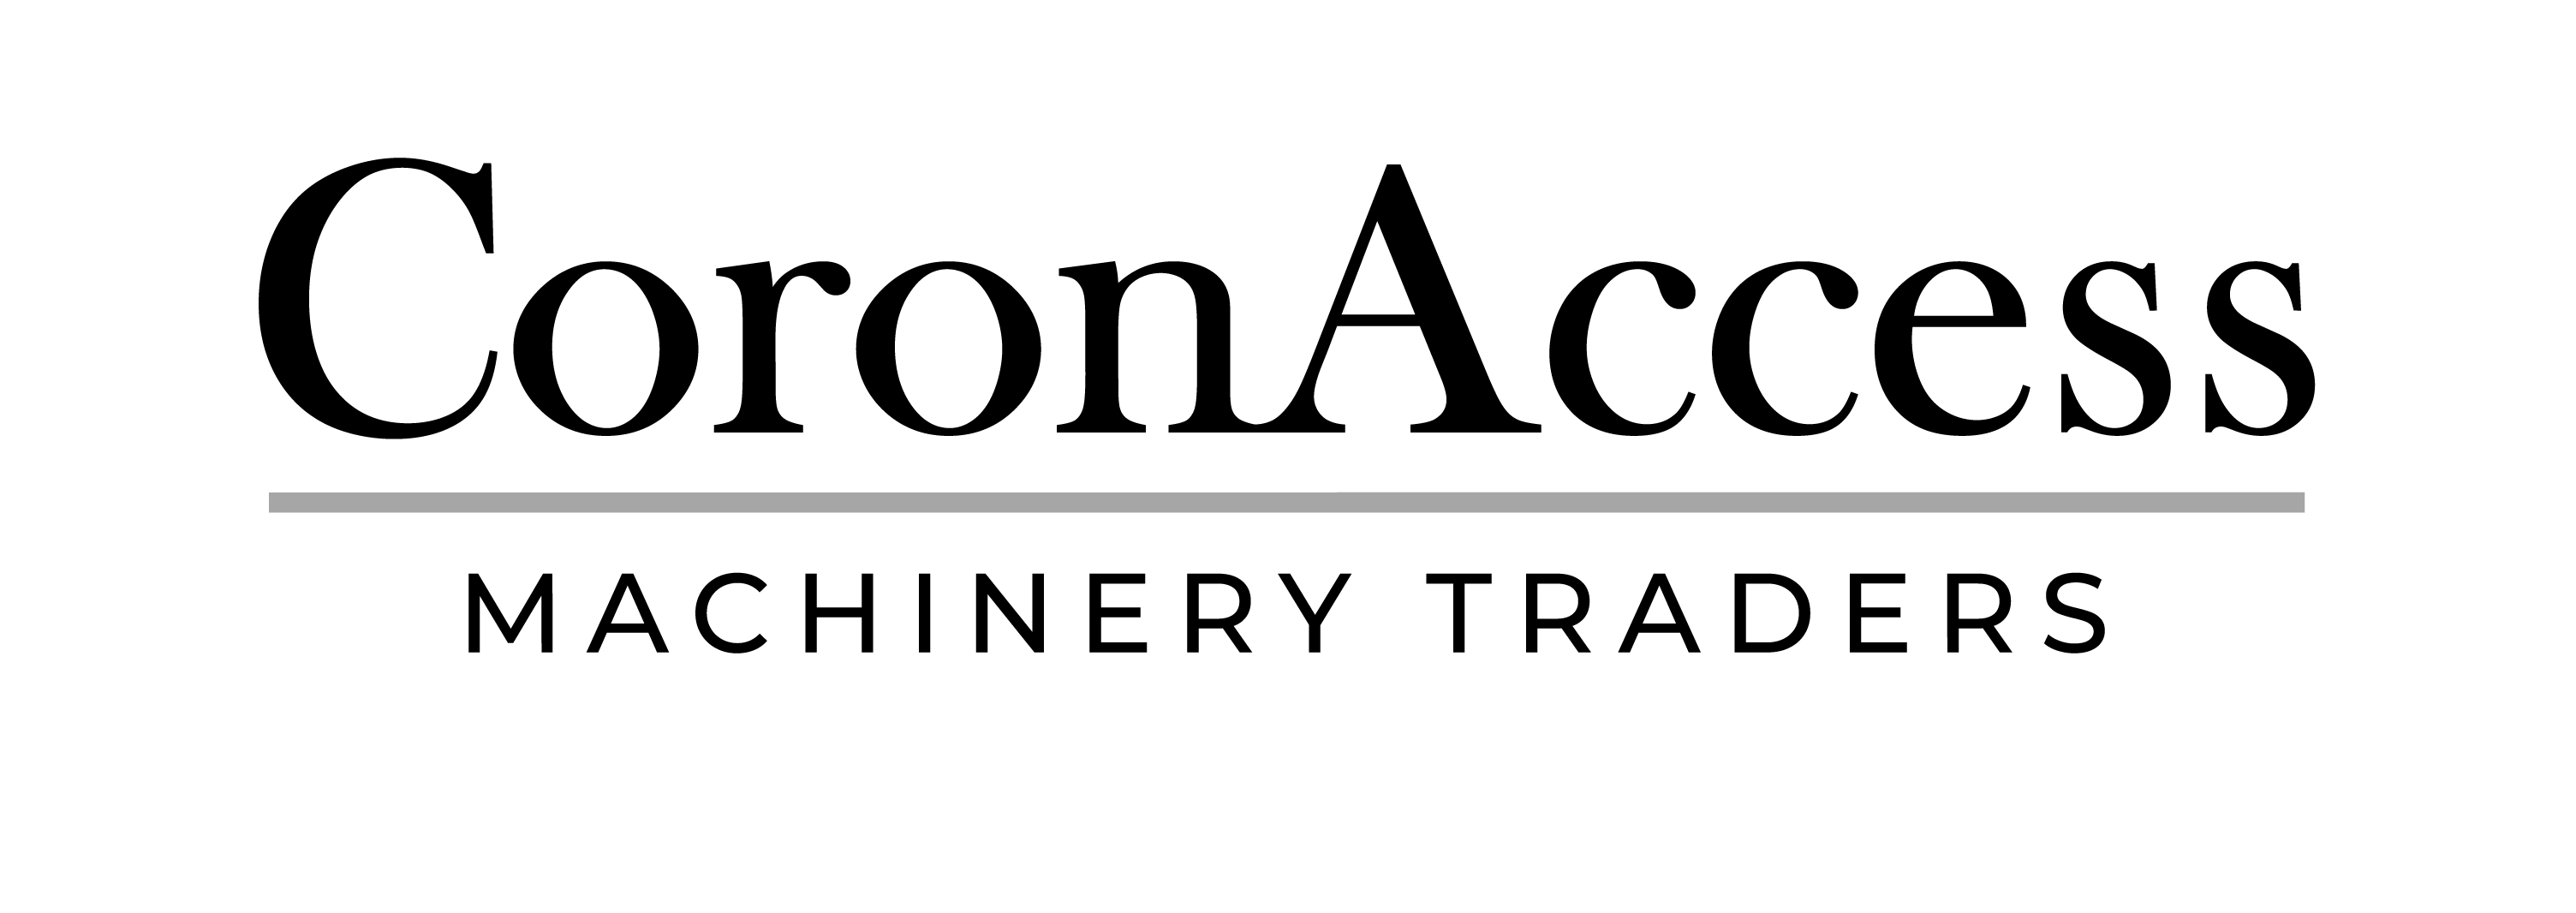 CoronAccess.com